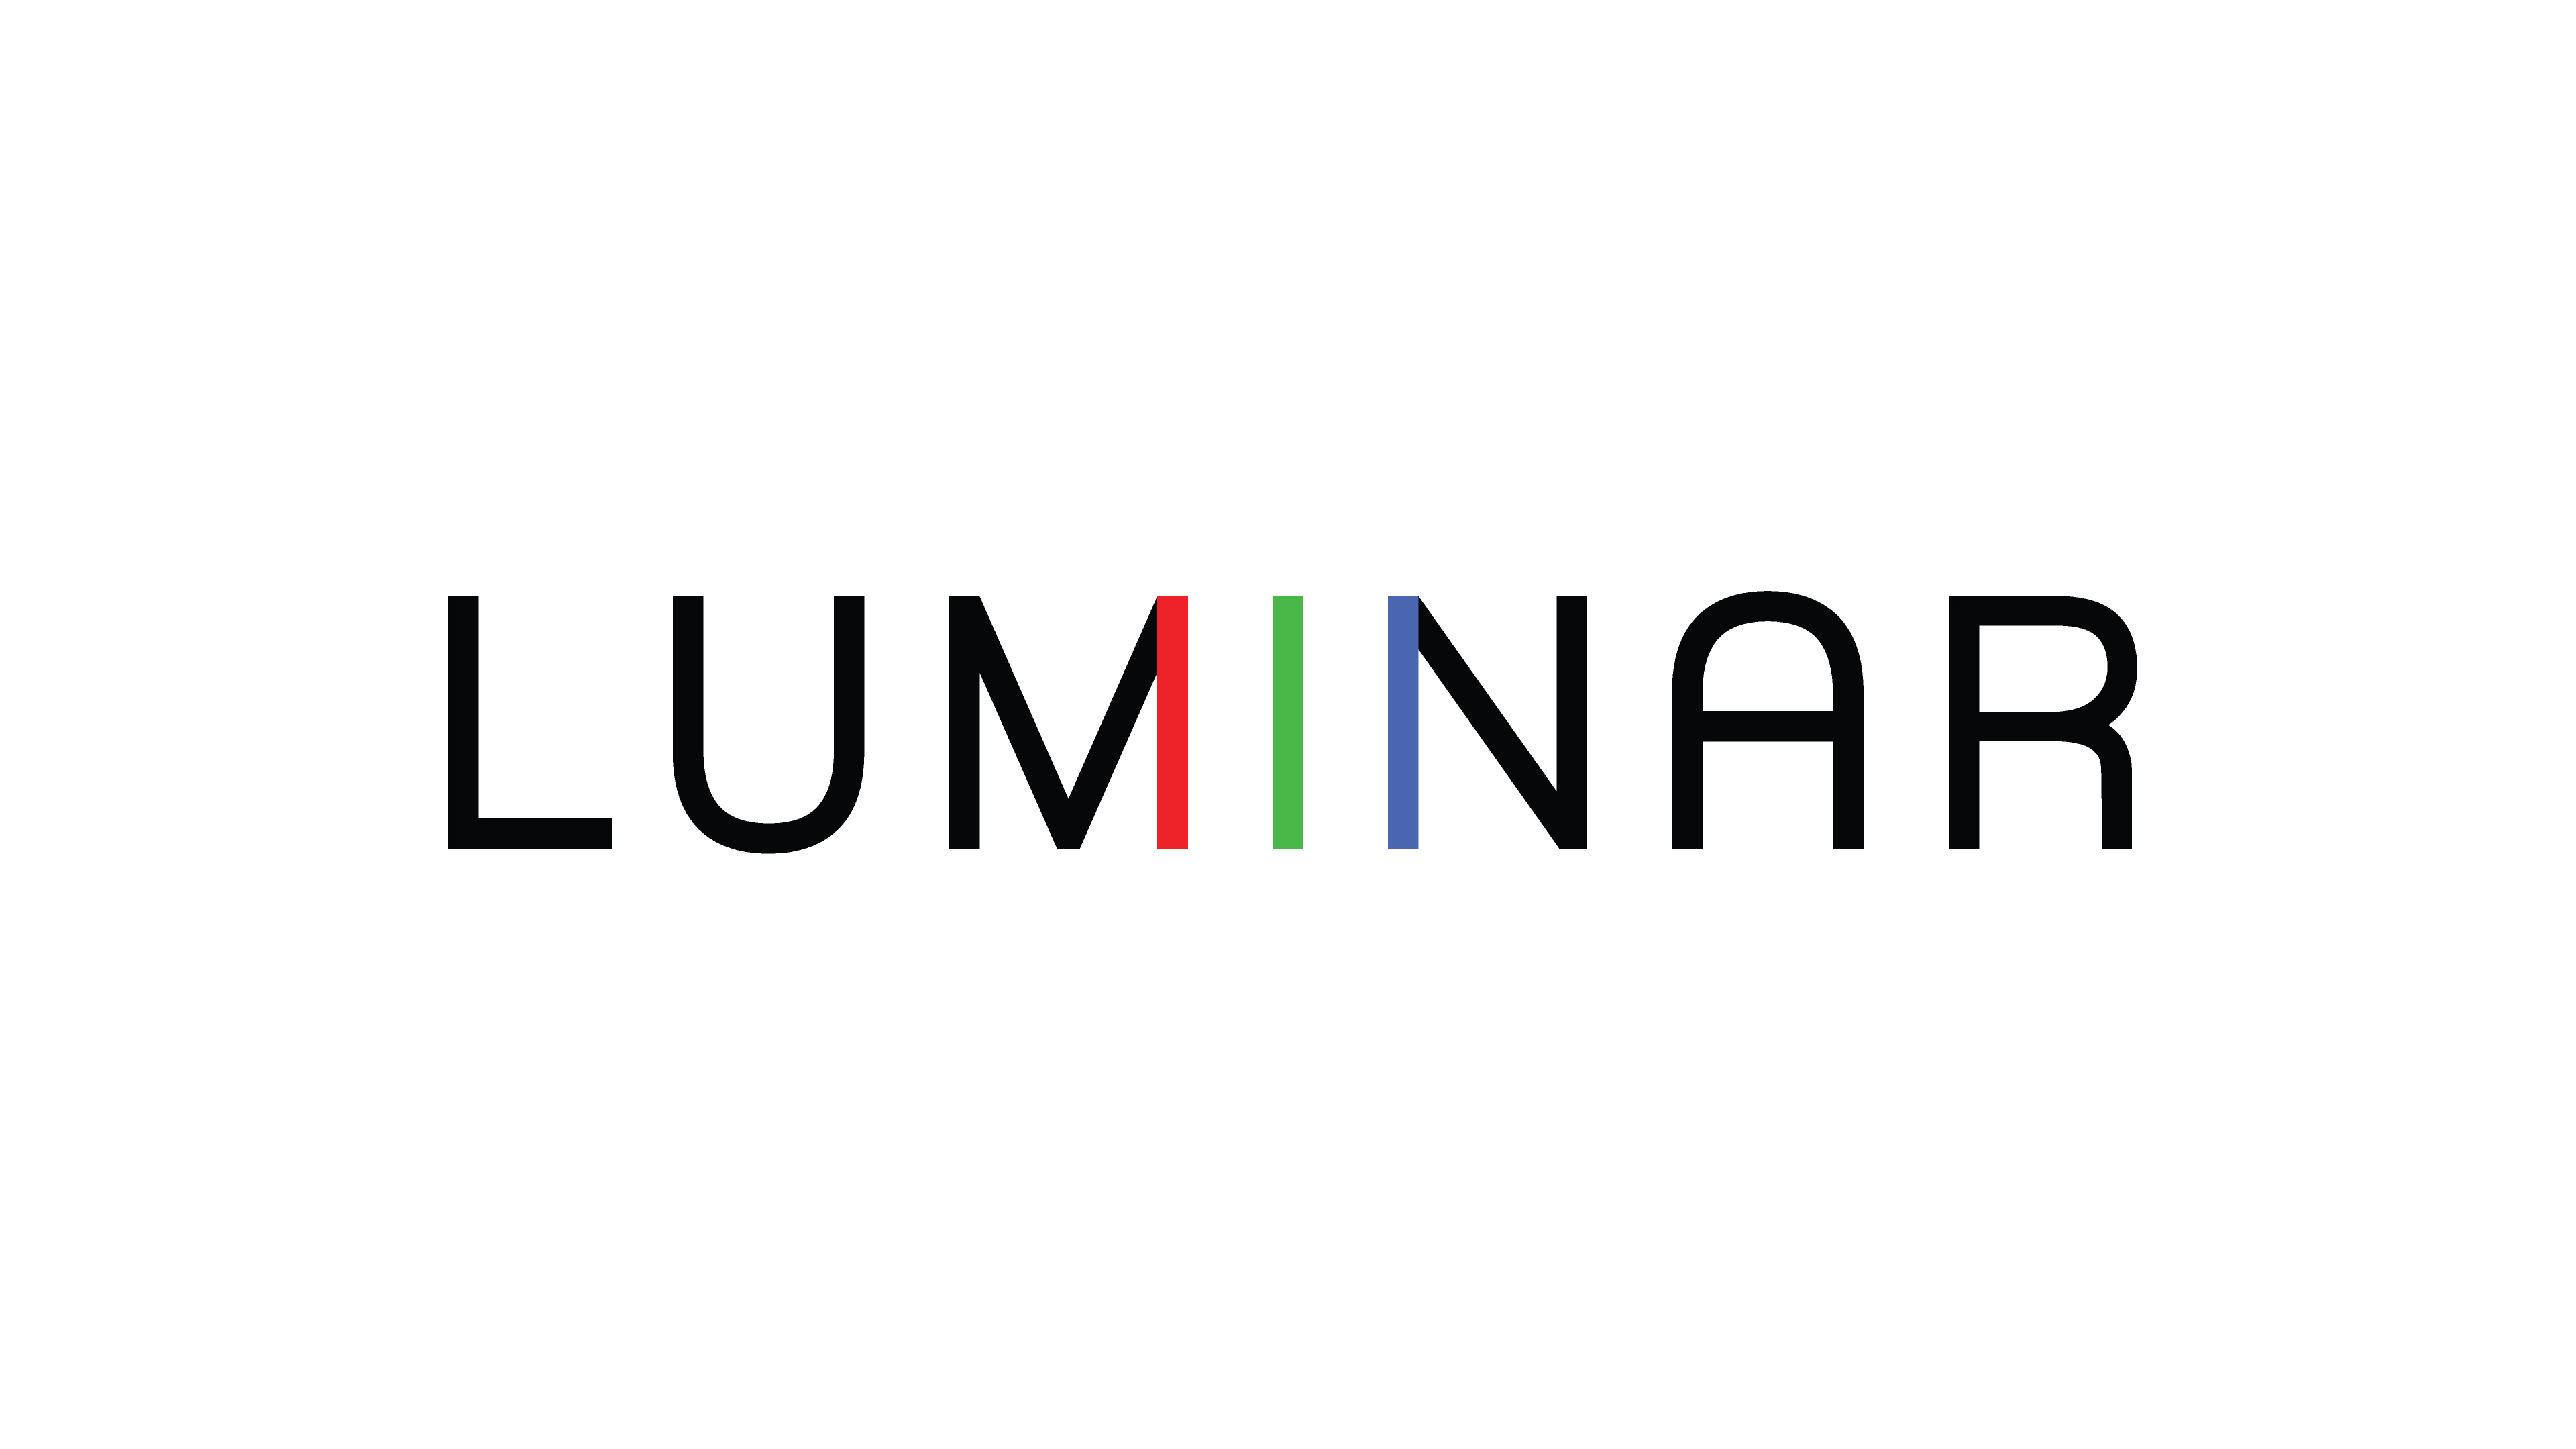 Luminar